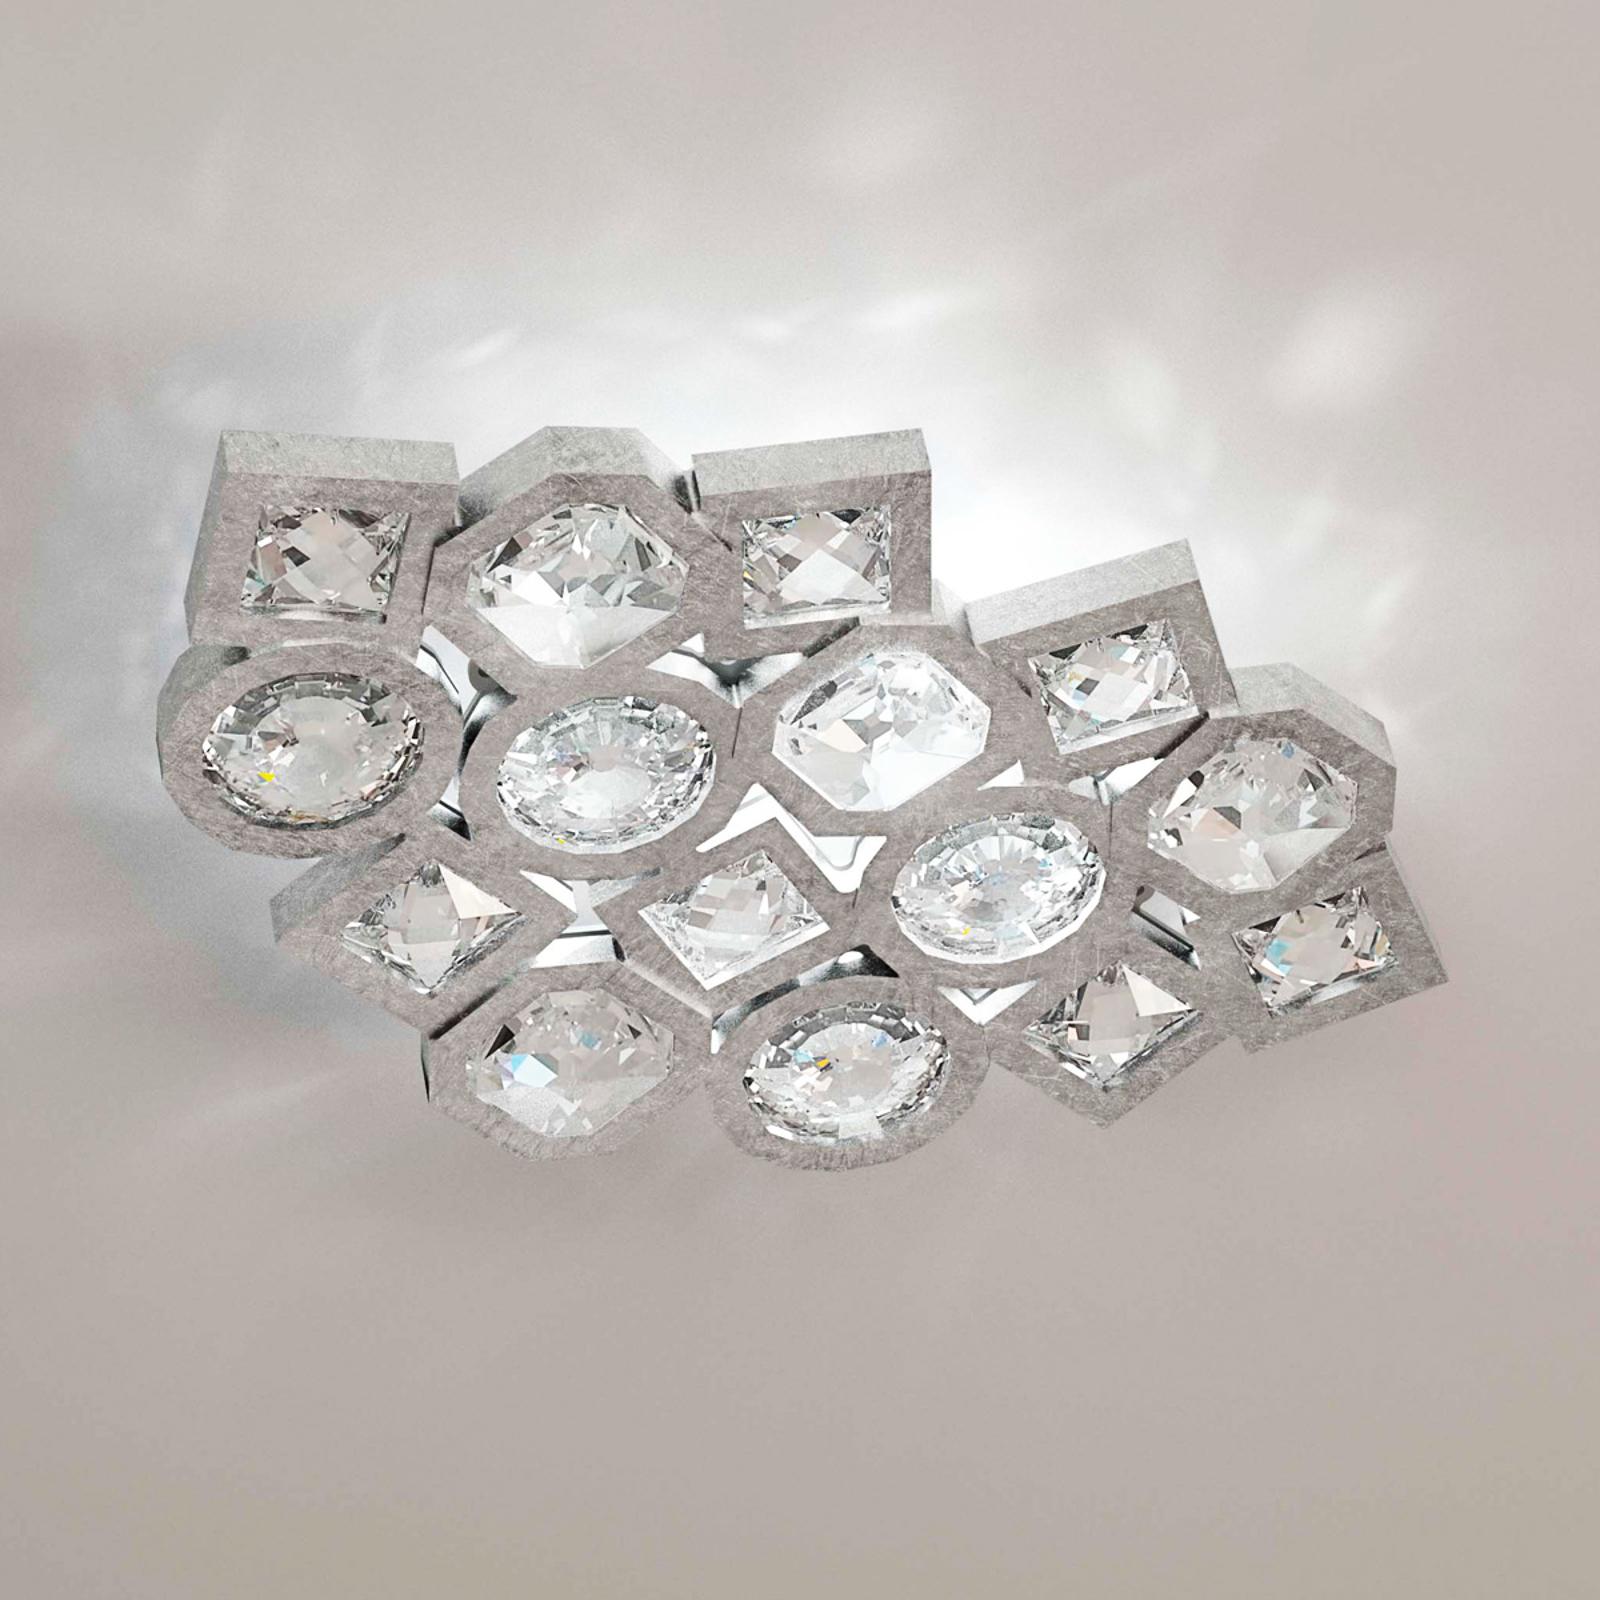 Mosaik-LED-Wandleuchte Stardust in Silber